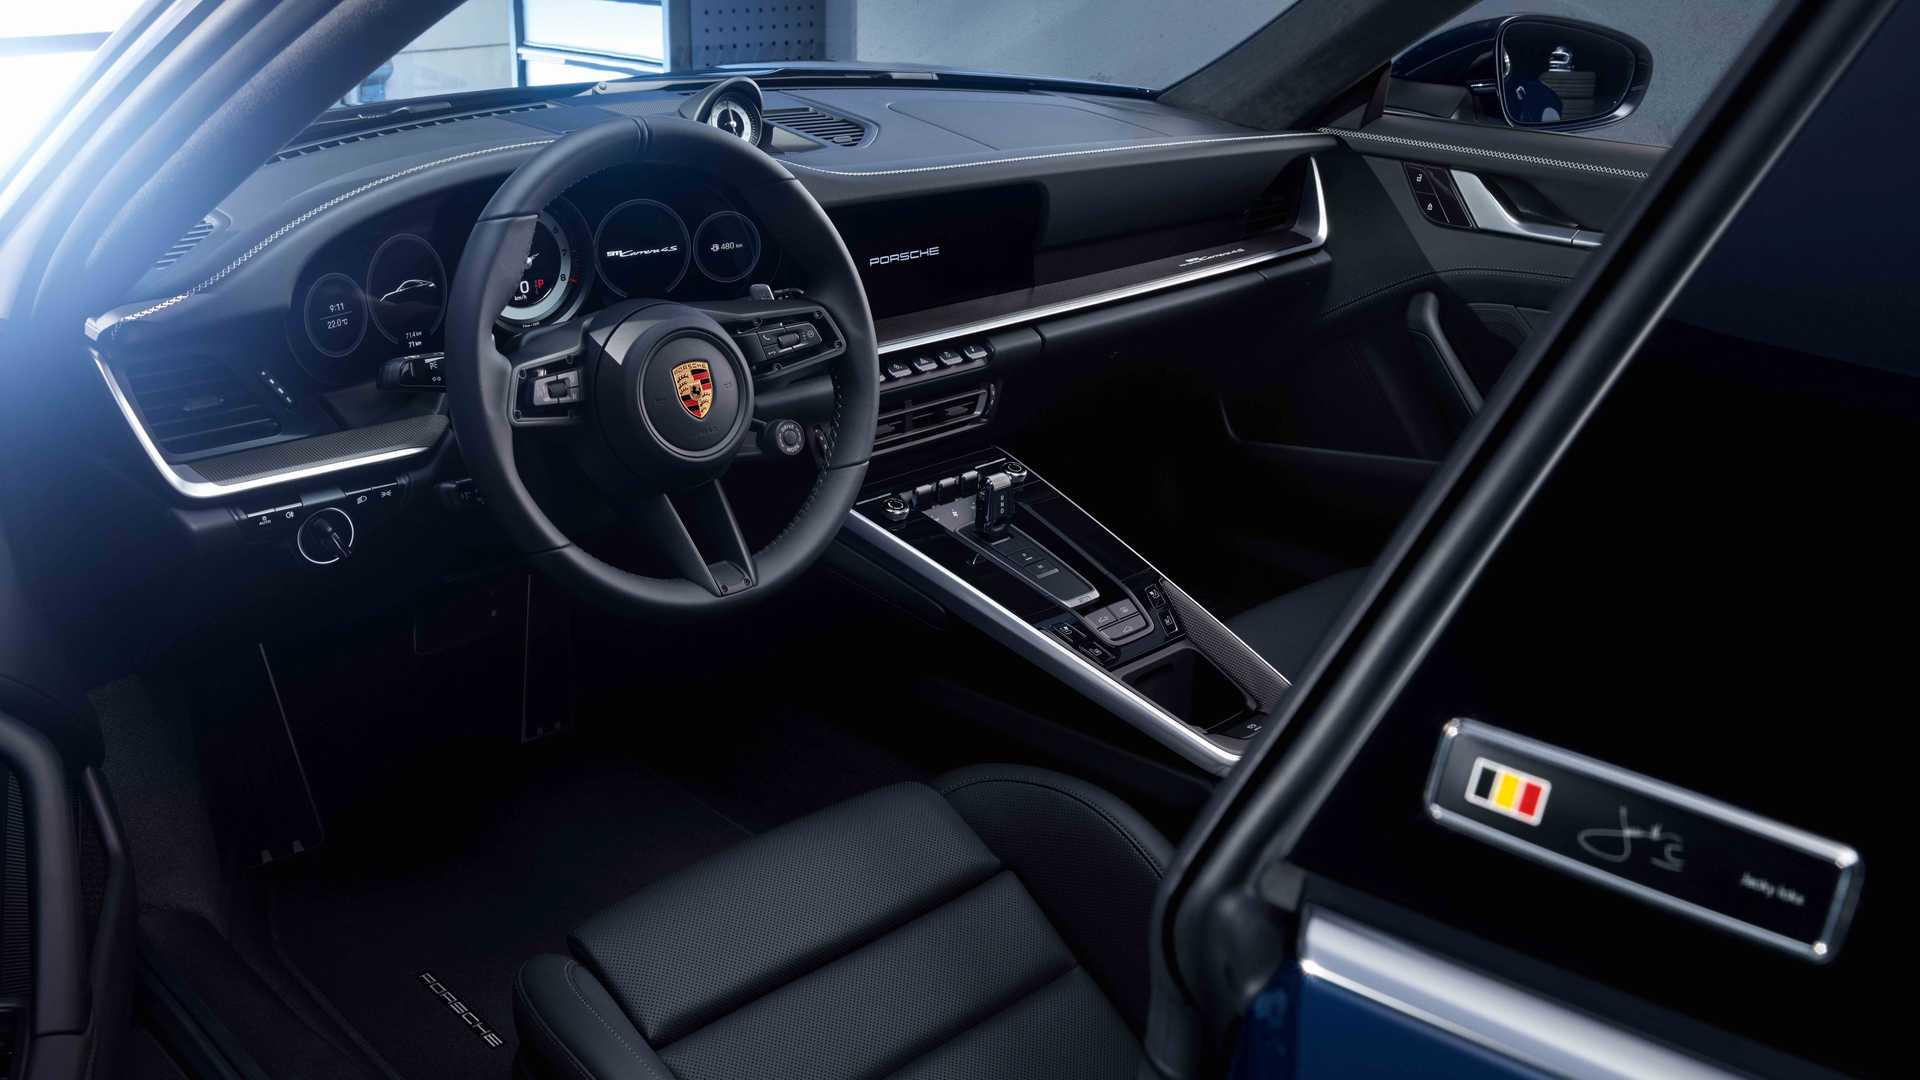 2020-porsche-911-belgian-legend-edition-10